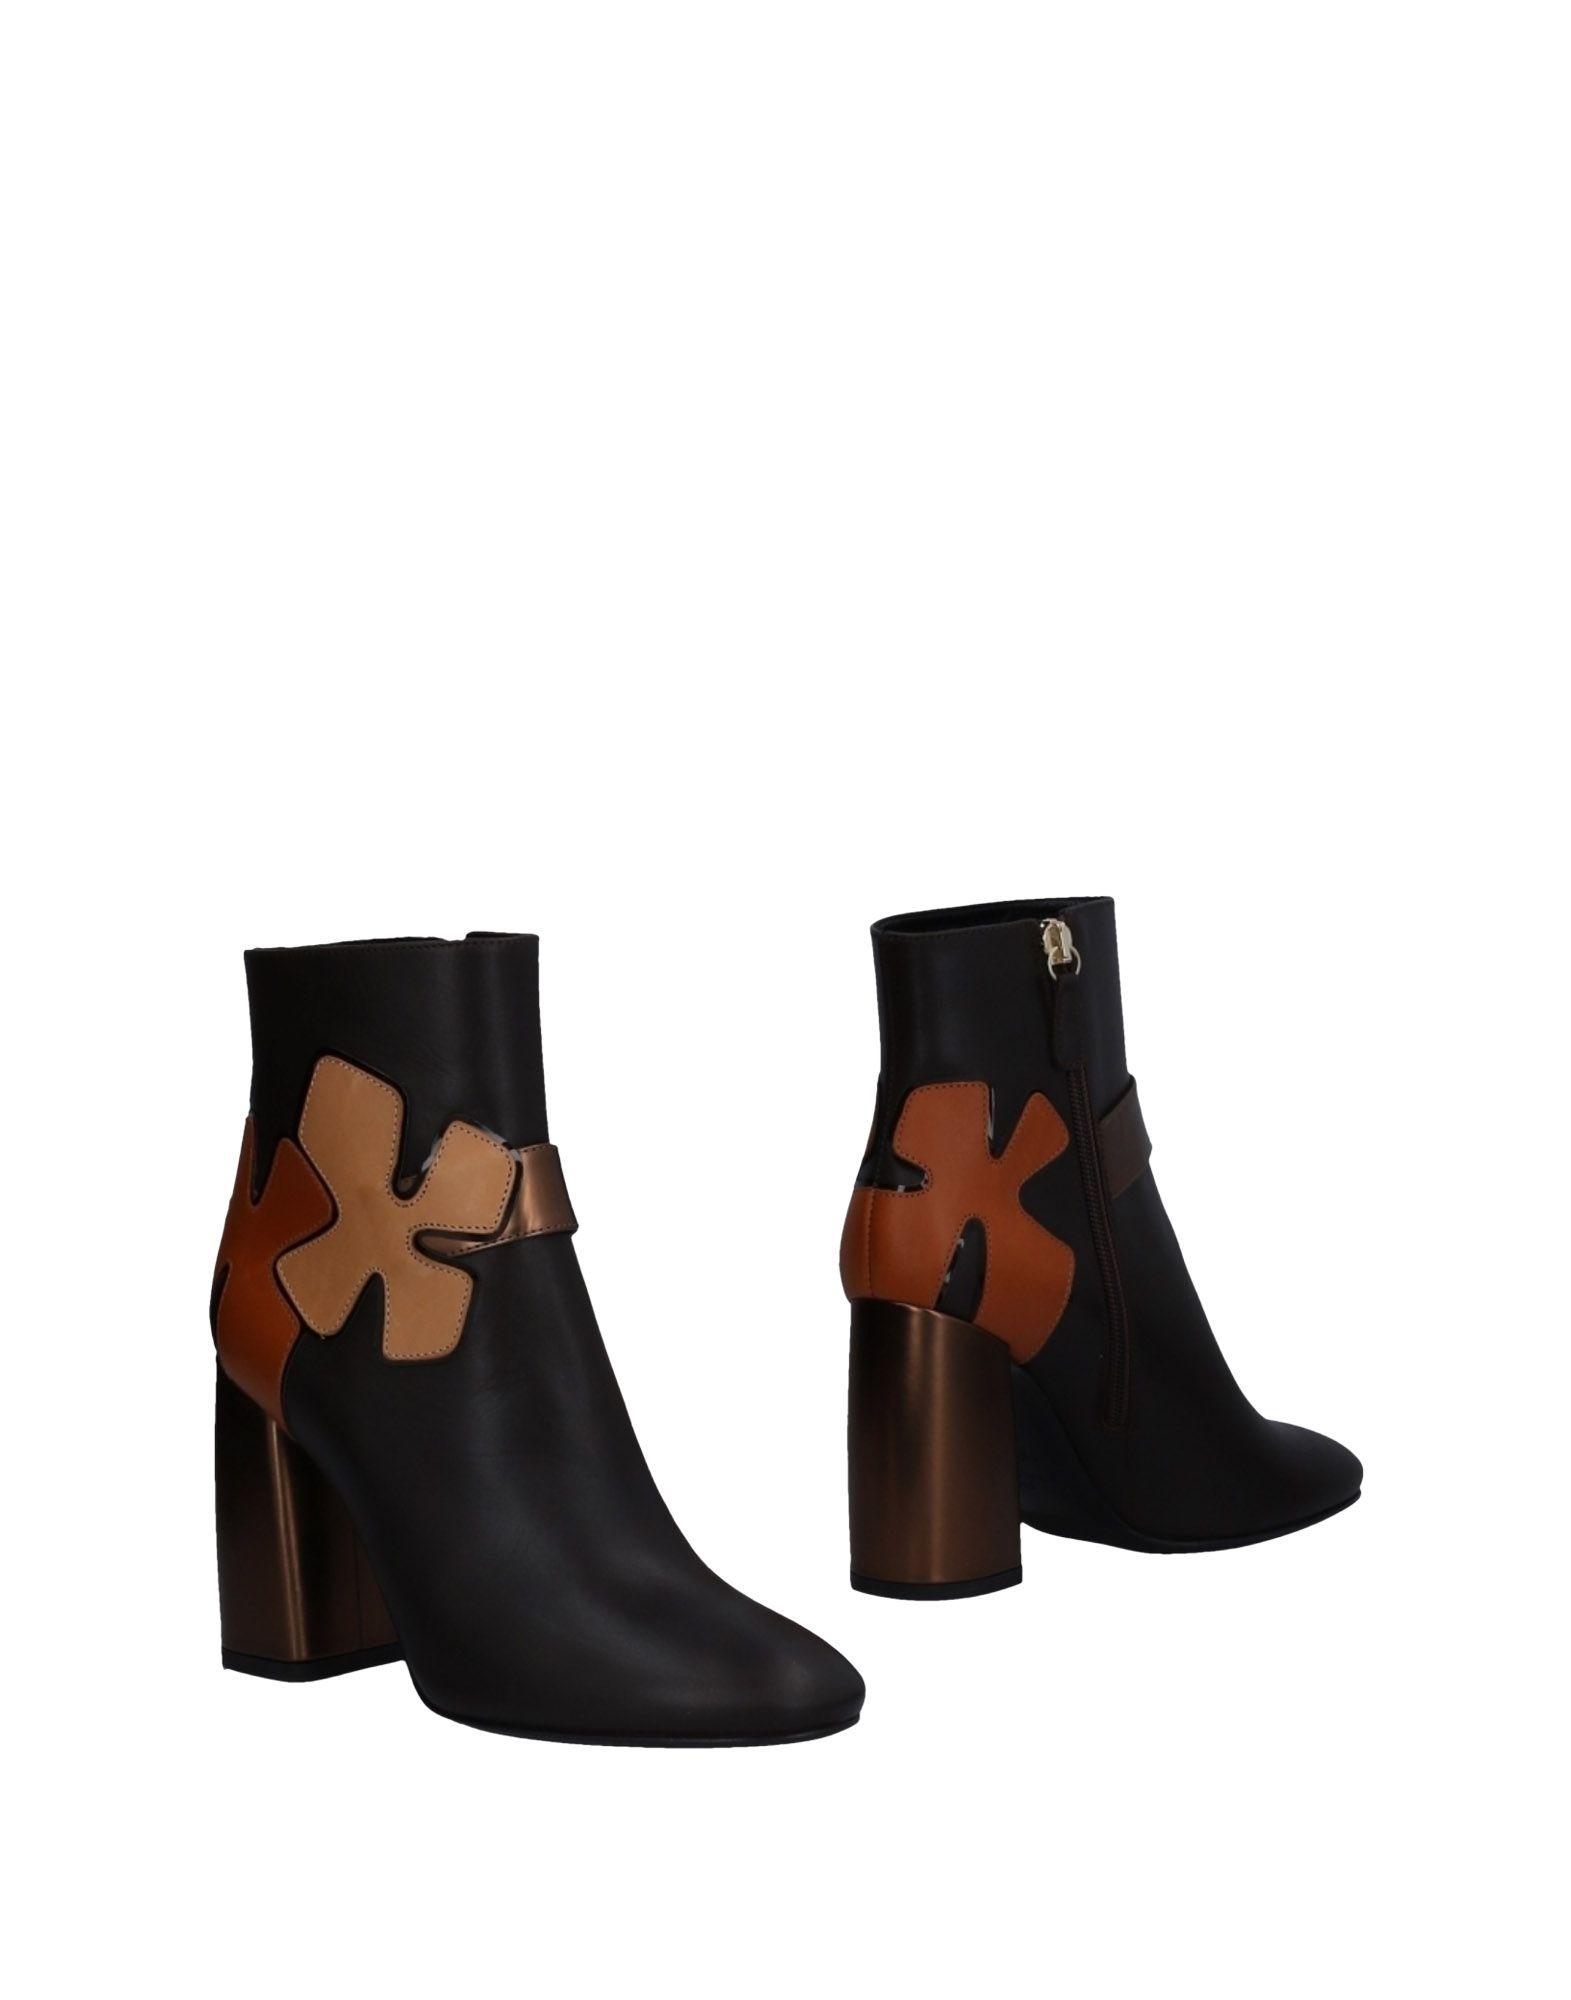 LELLA BALDI Ankle Boot in Dark Brown